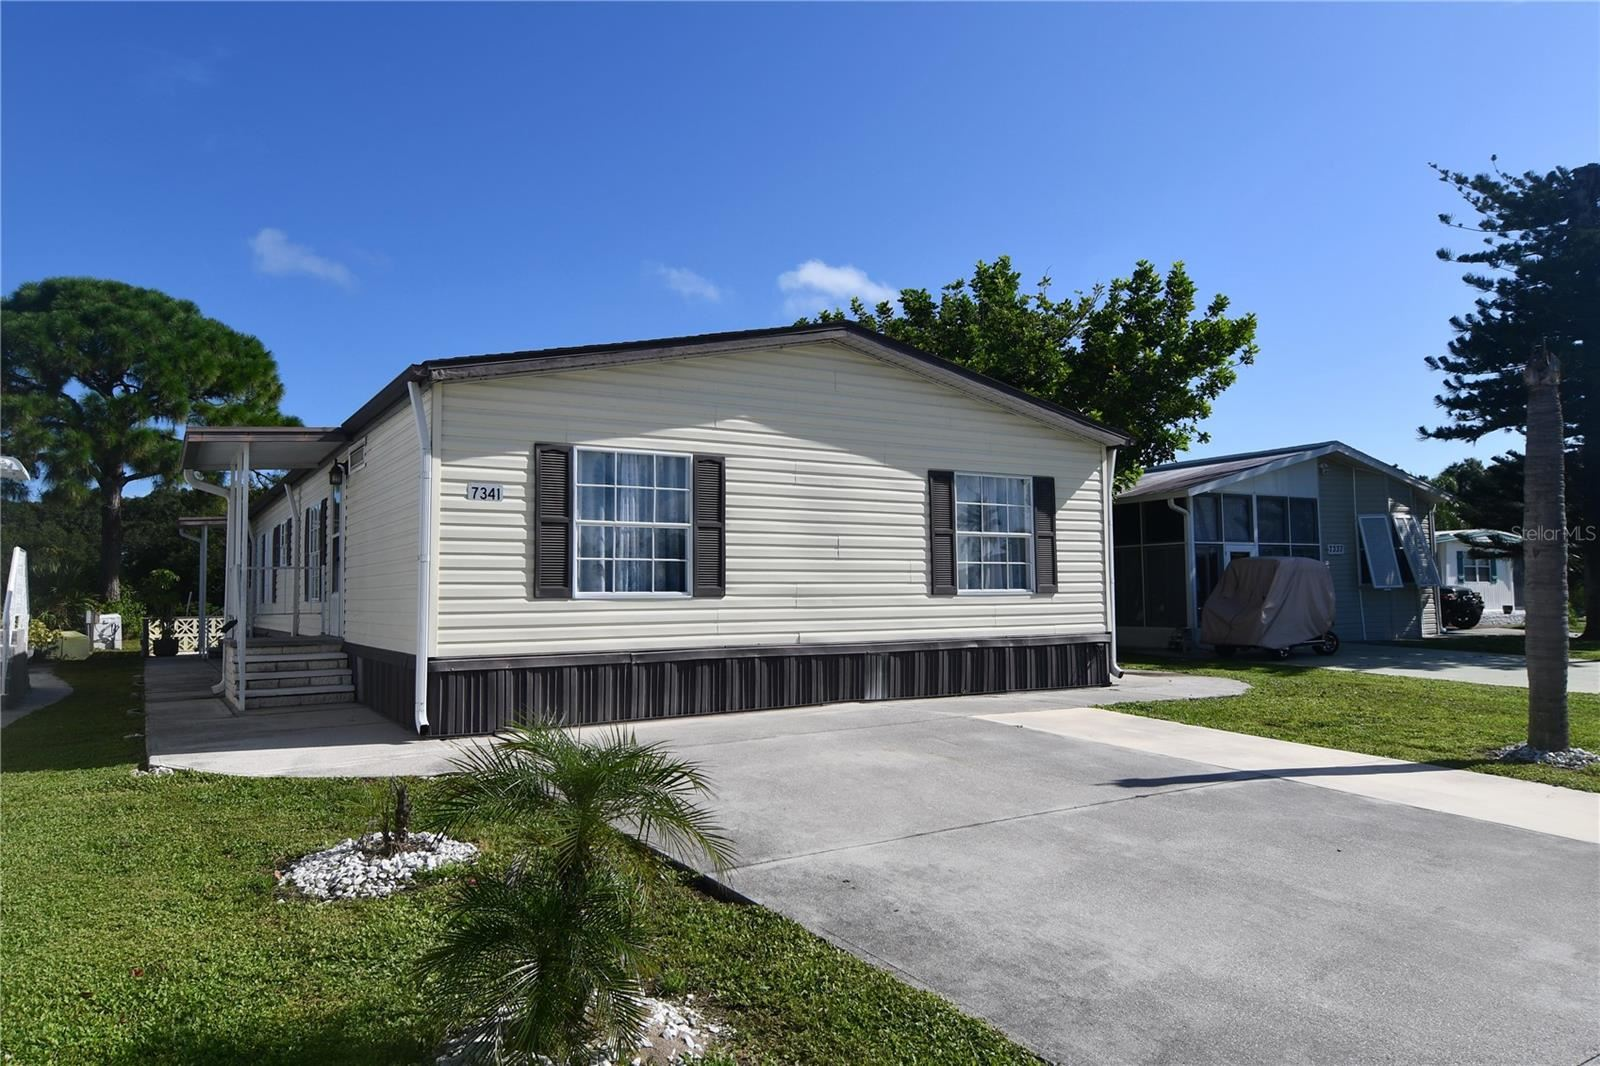 Photo of 7341 SWINTON AVENUE, PORT CHARLOTTE, FL 33981 (MLS # C7427243)